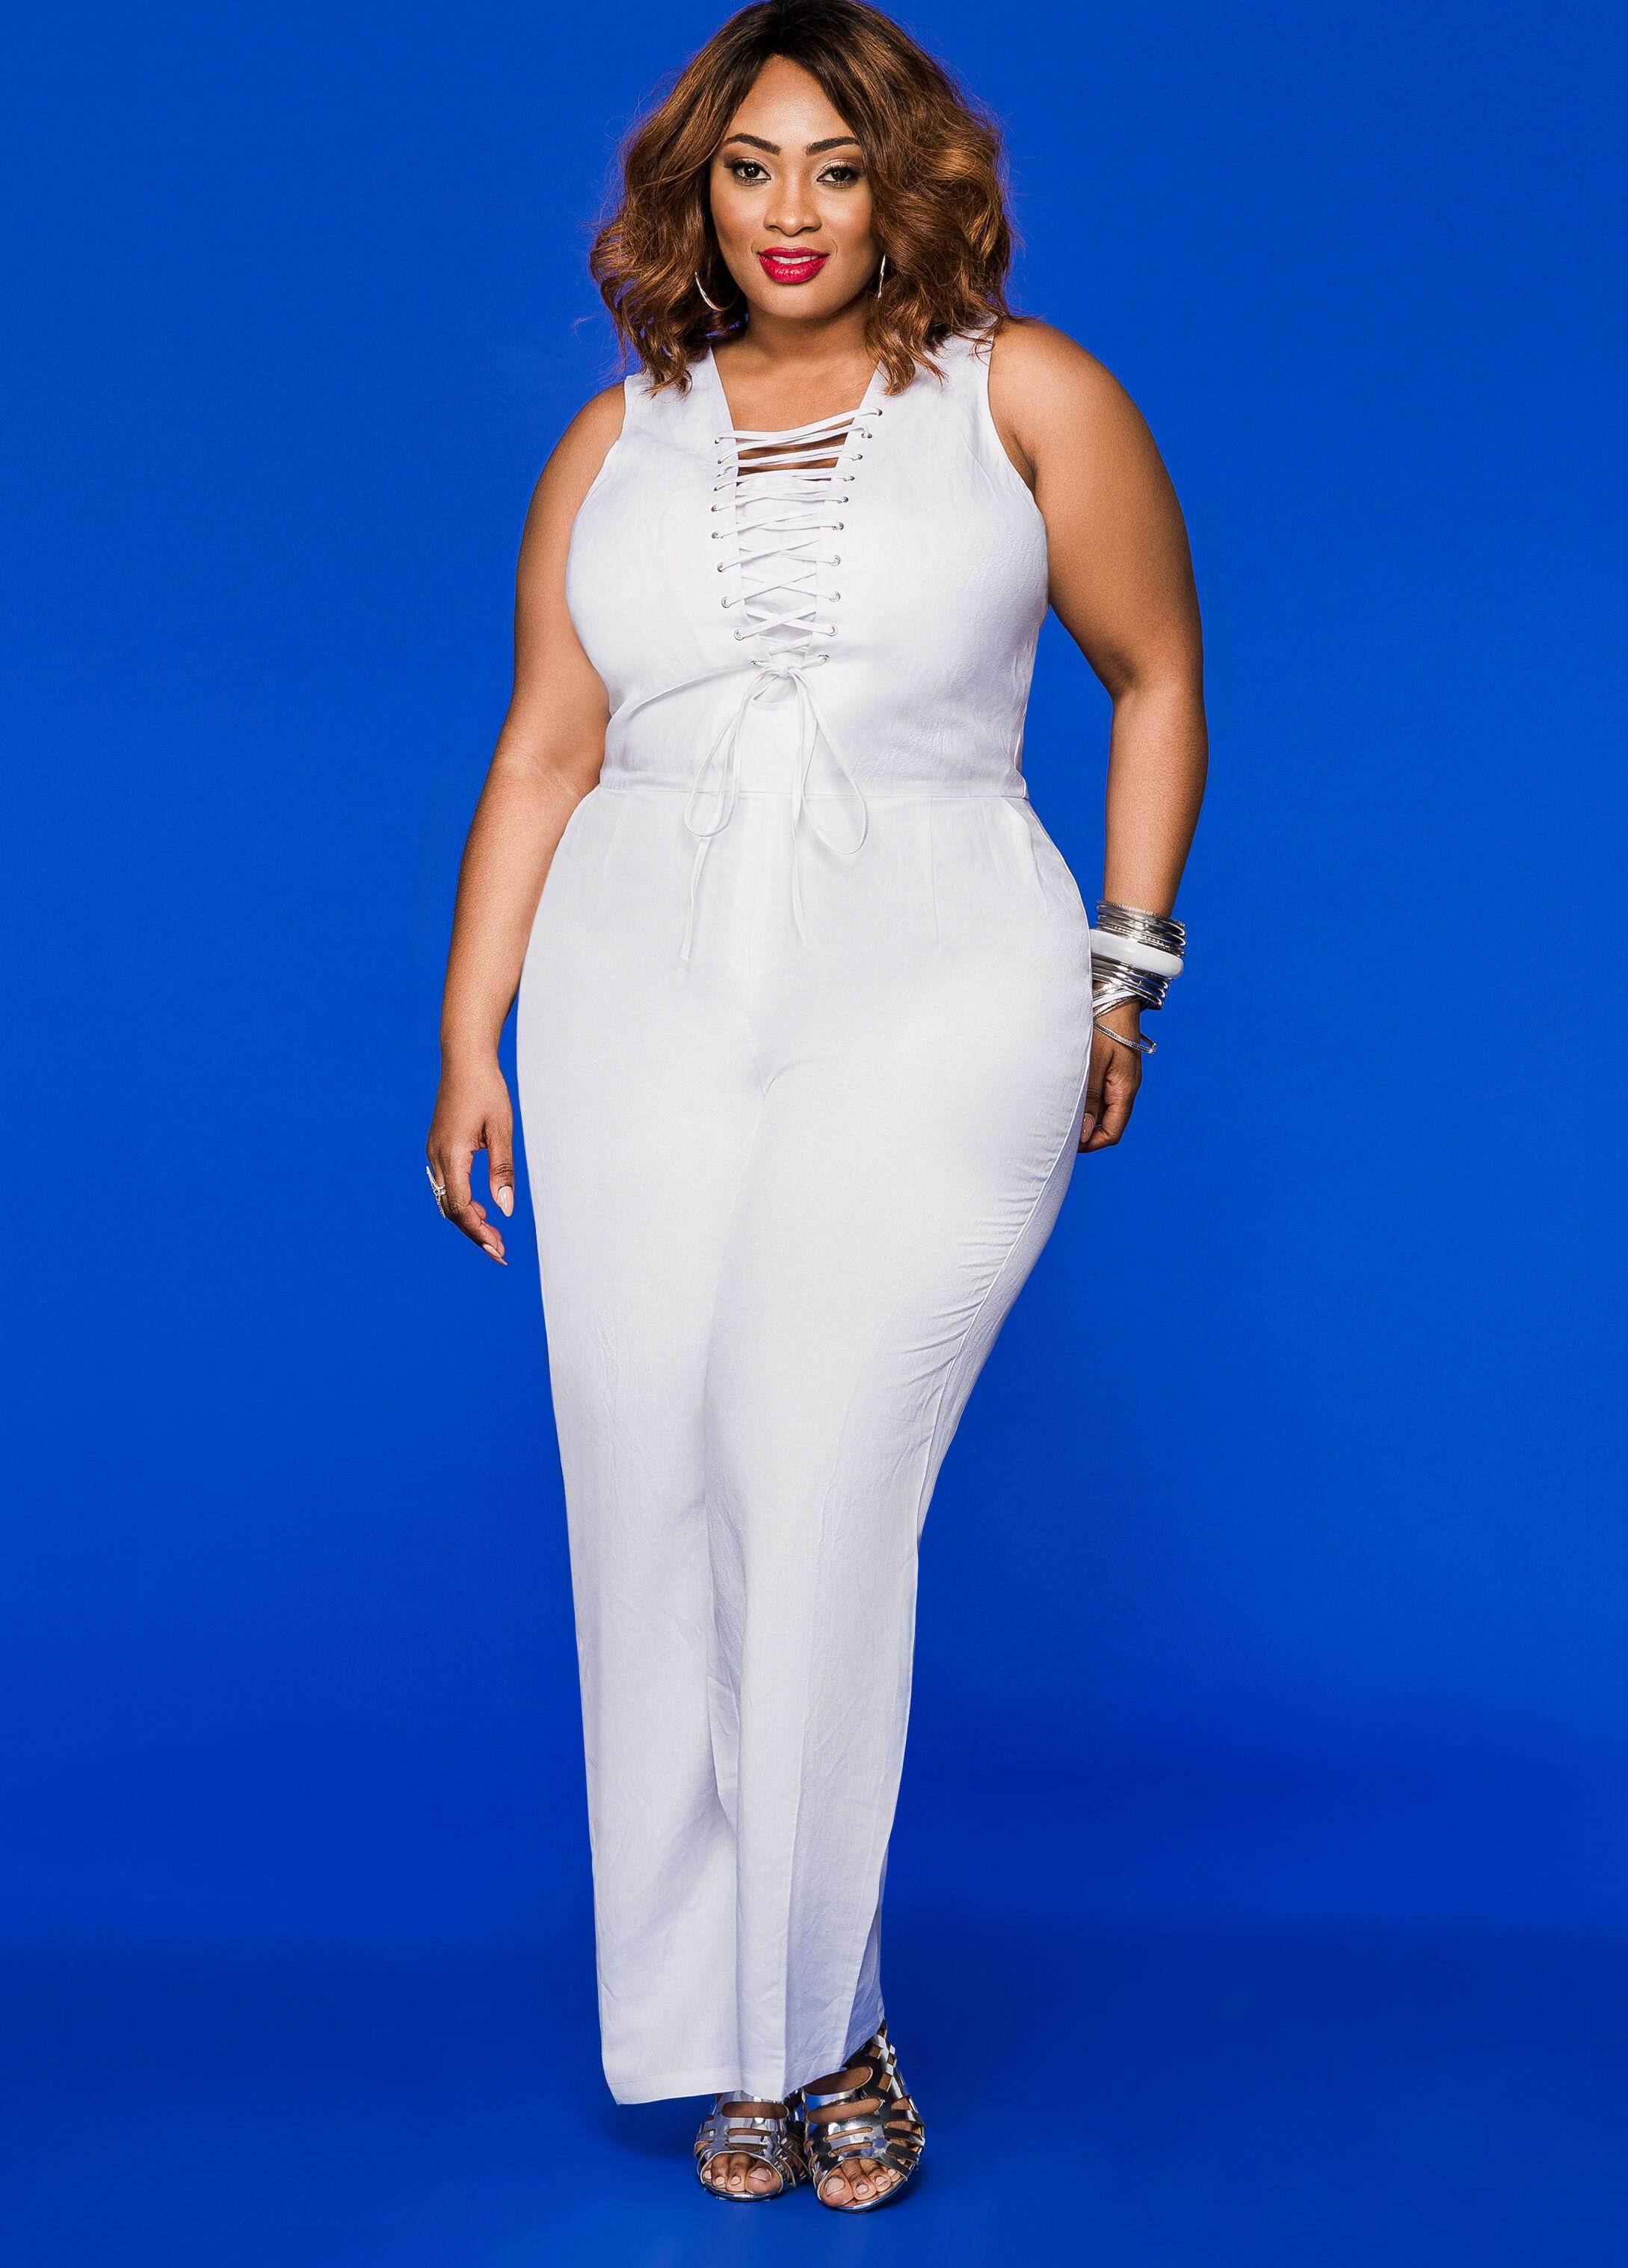 bed0ea62bac Plus size maxi dresses jumpsuits rompers ashley stewart jpg 346x482 Plus  size white dressy jumpsuit